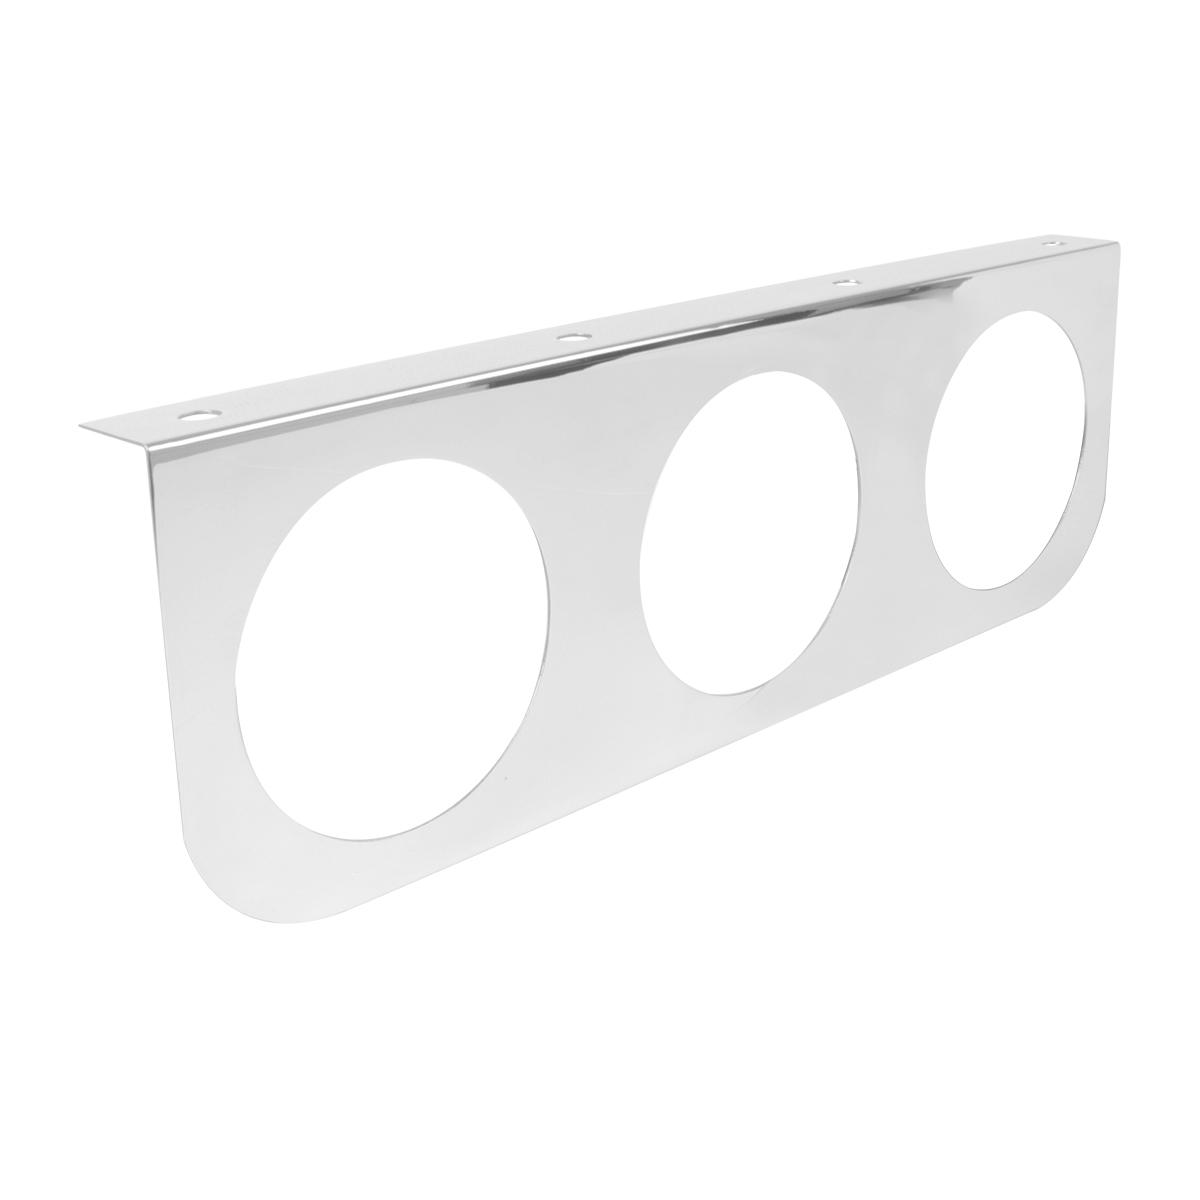 "#81500 Chrome Plated Steel Triple Light ""L"" Shape Mounting Bracket"